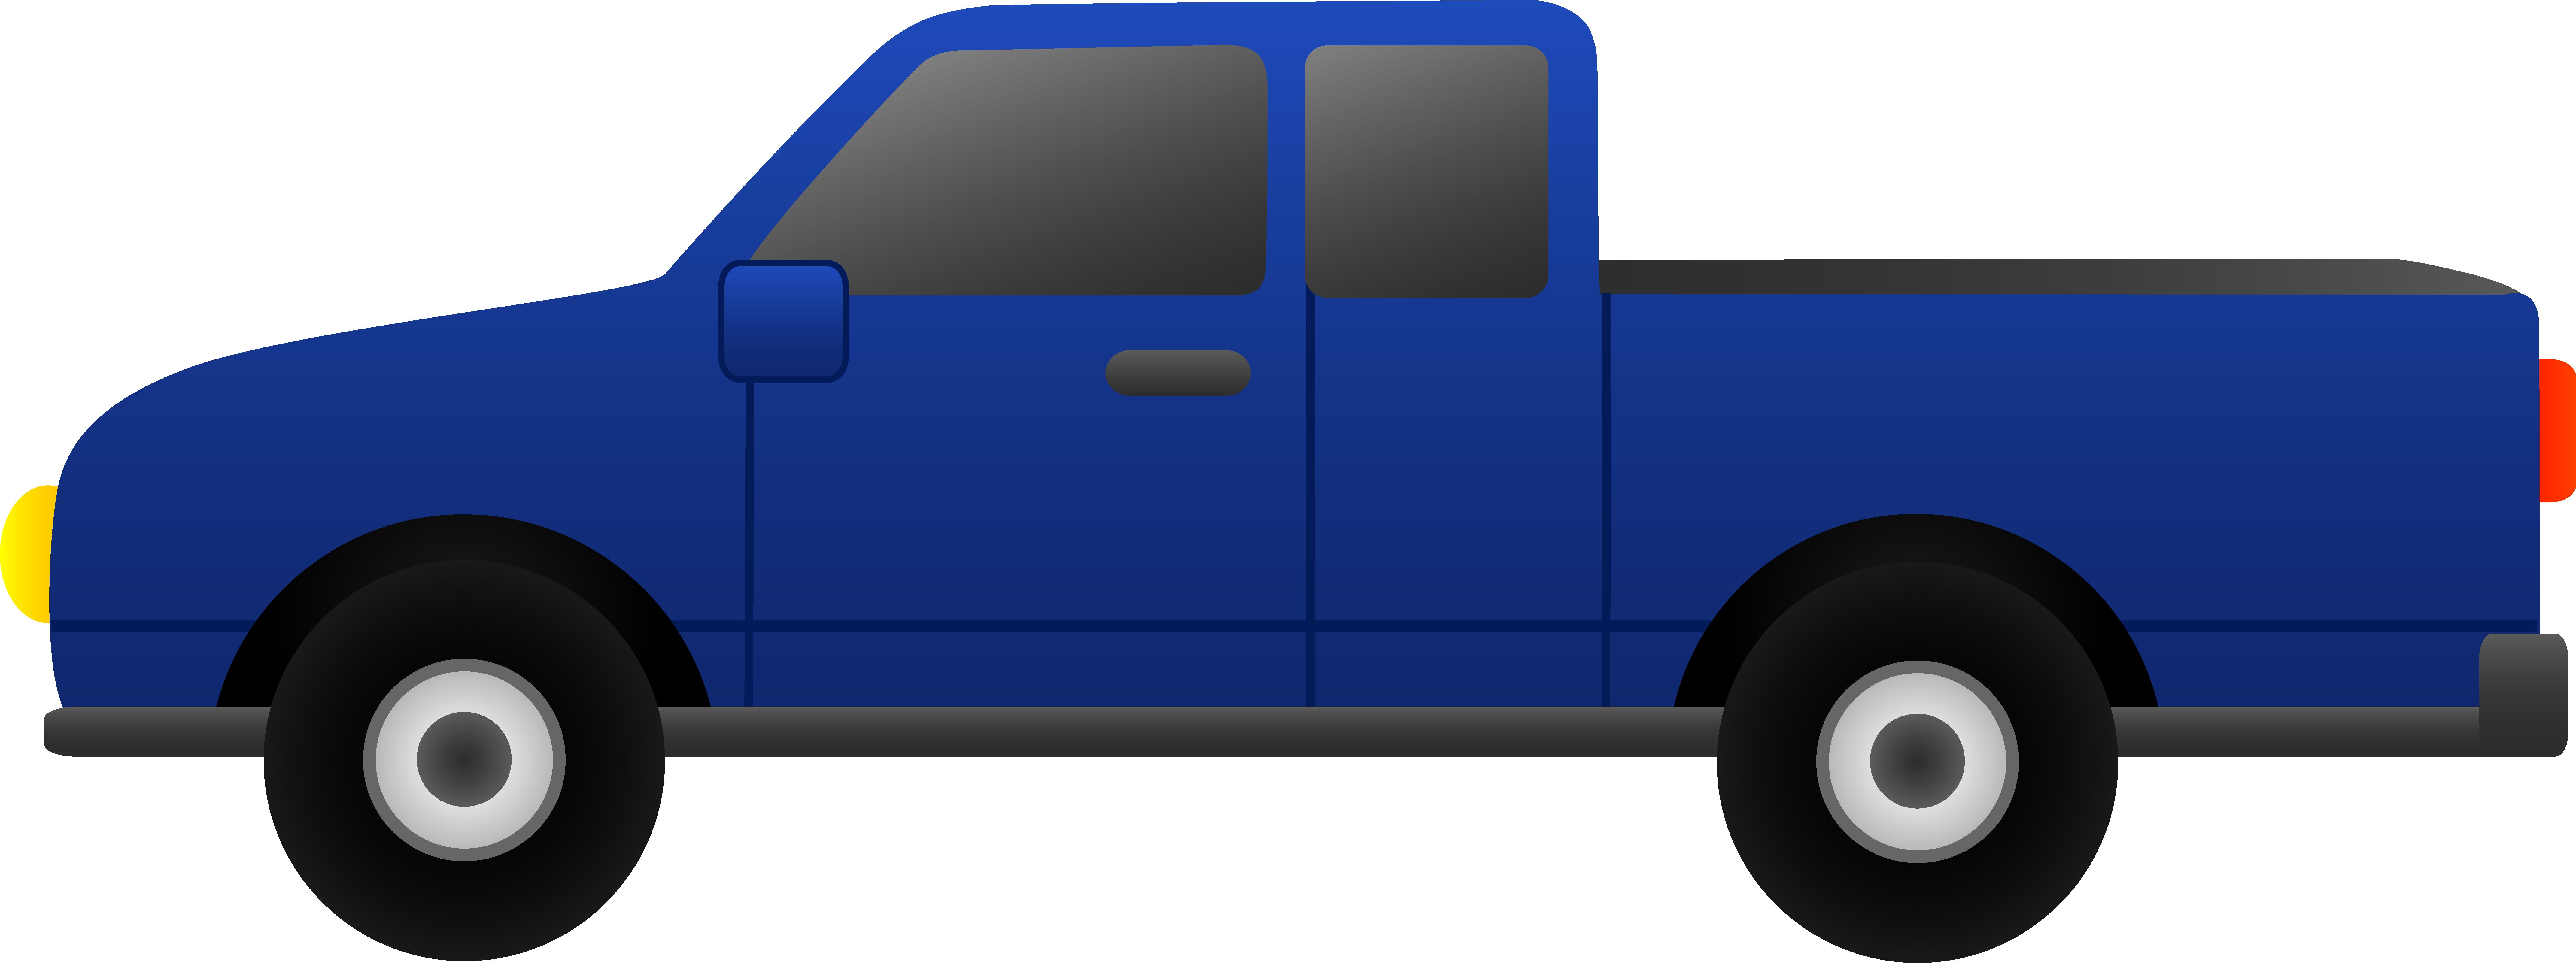 clip art transparent download Pickup clipart. Toyota truck .